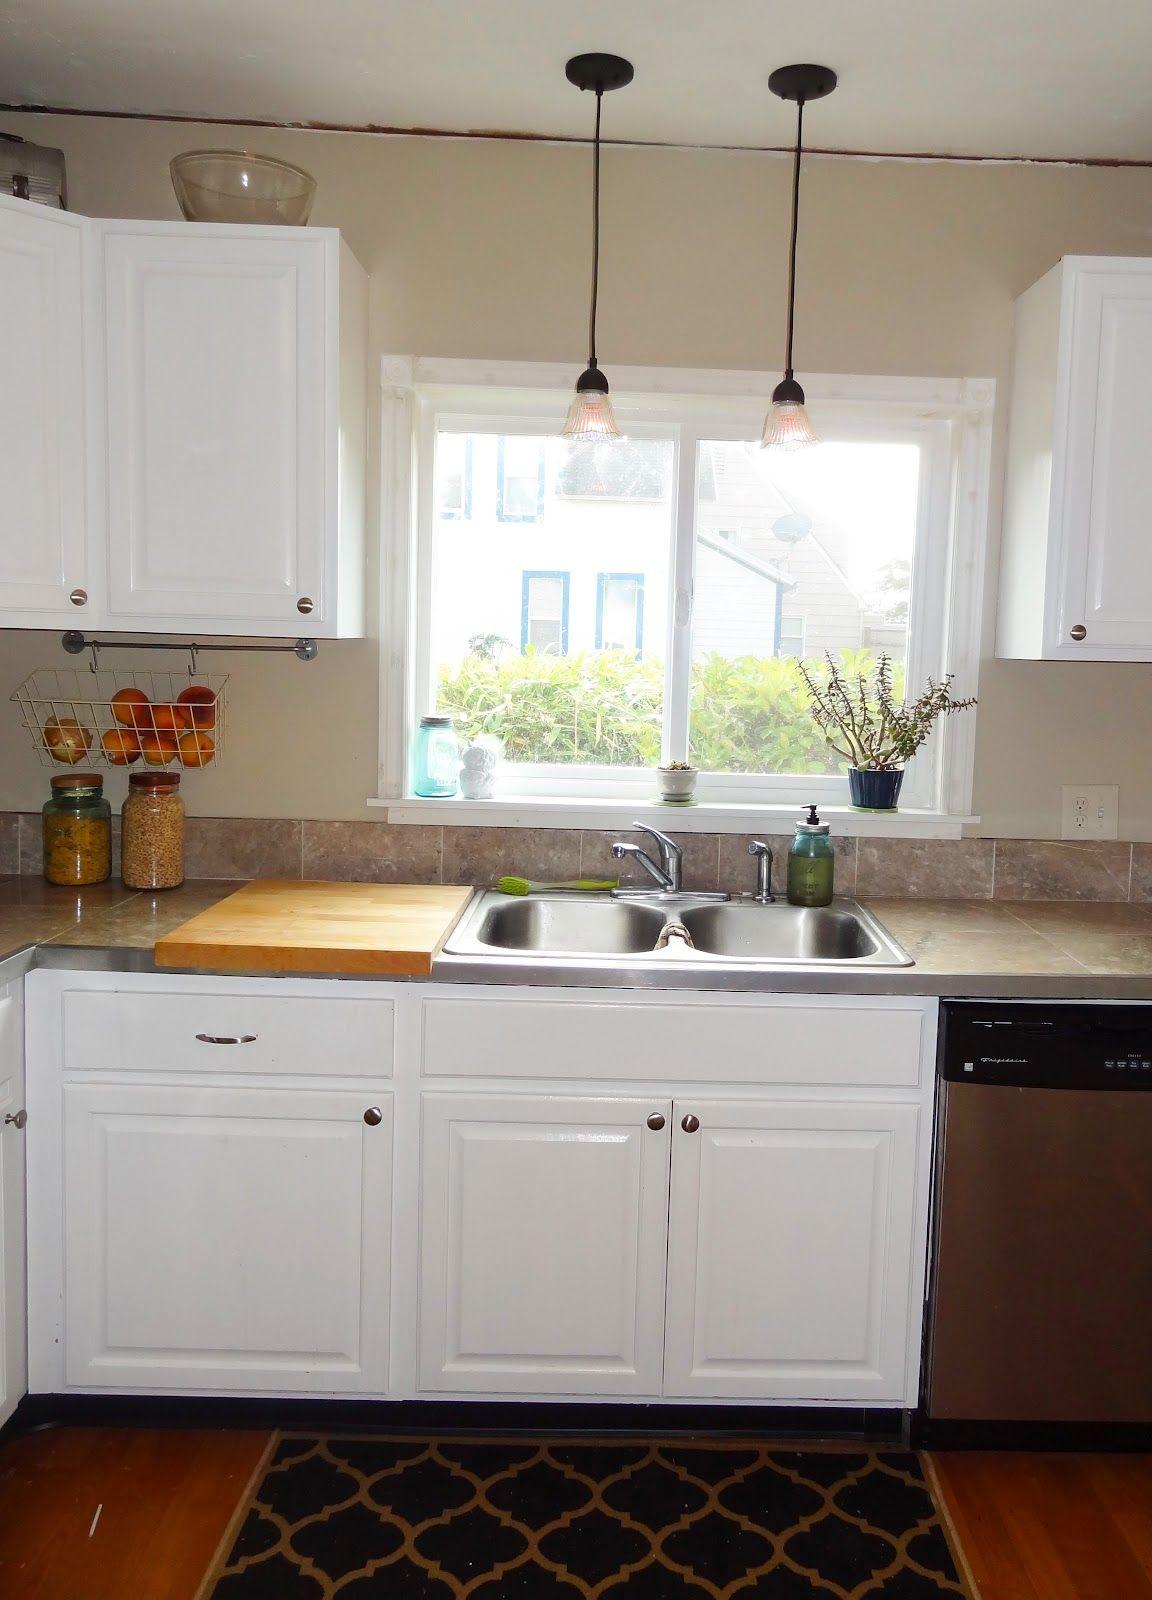 Ideas For Lighting Over Kitchen Sink Kitchen Sink Lighting